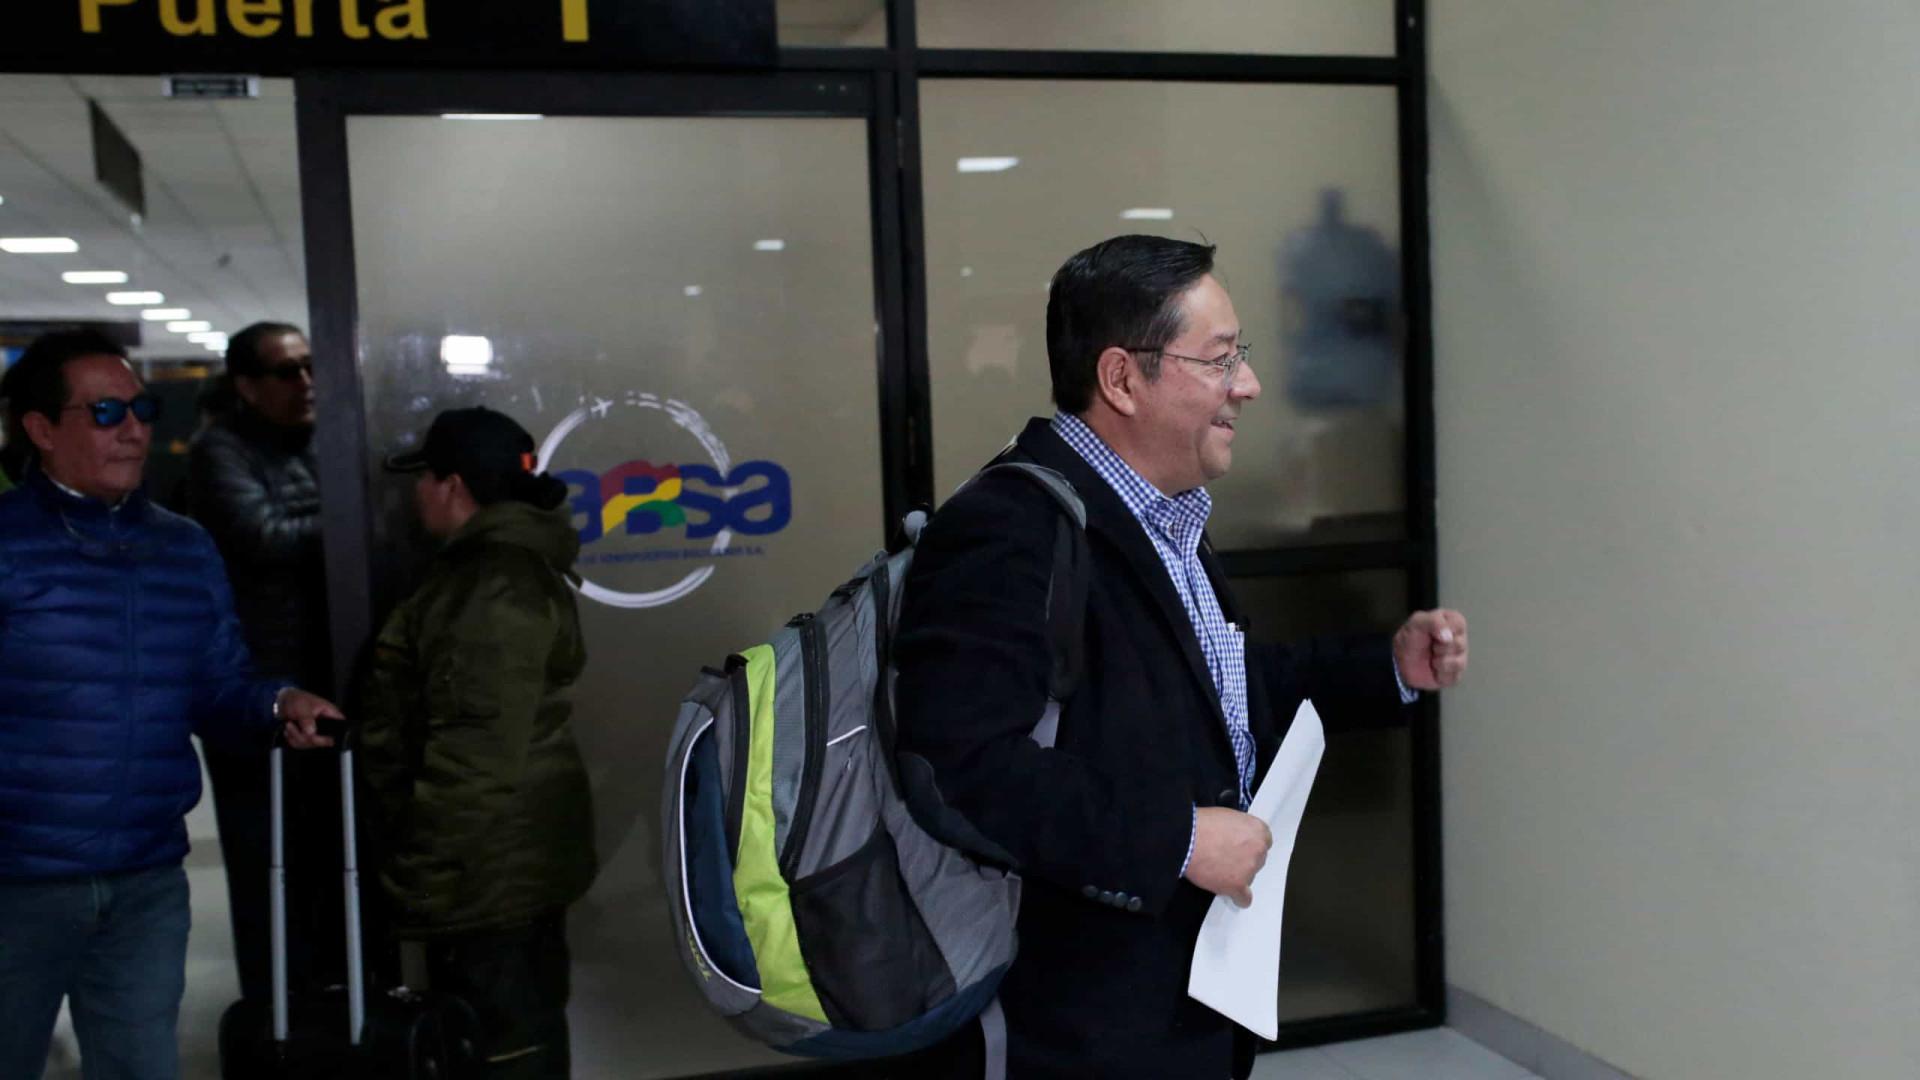 Candidato à Presidência da Bolívia é intimado ao desembarcar no país